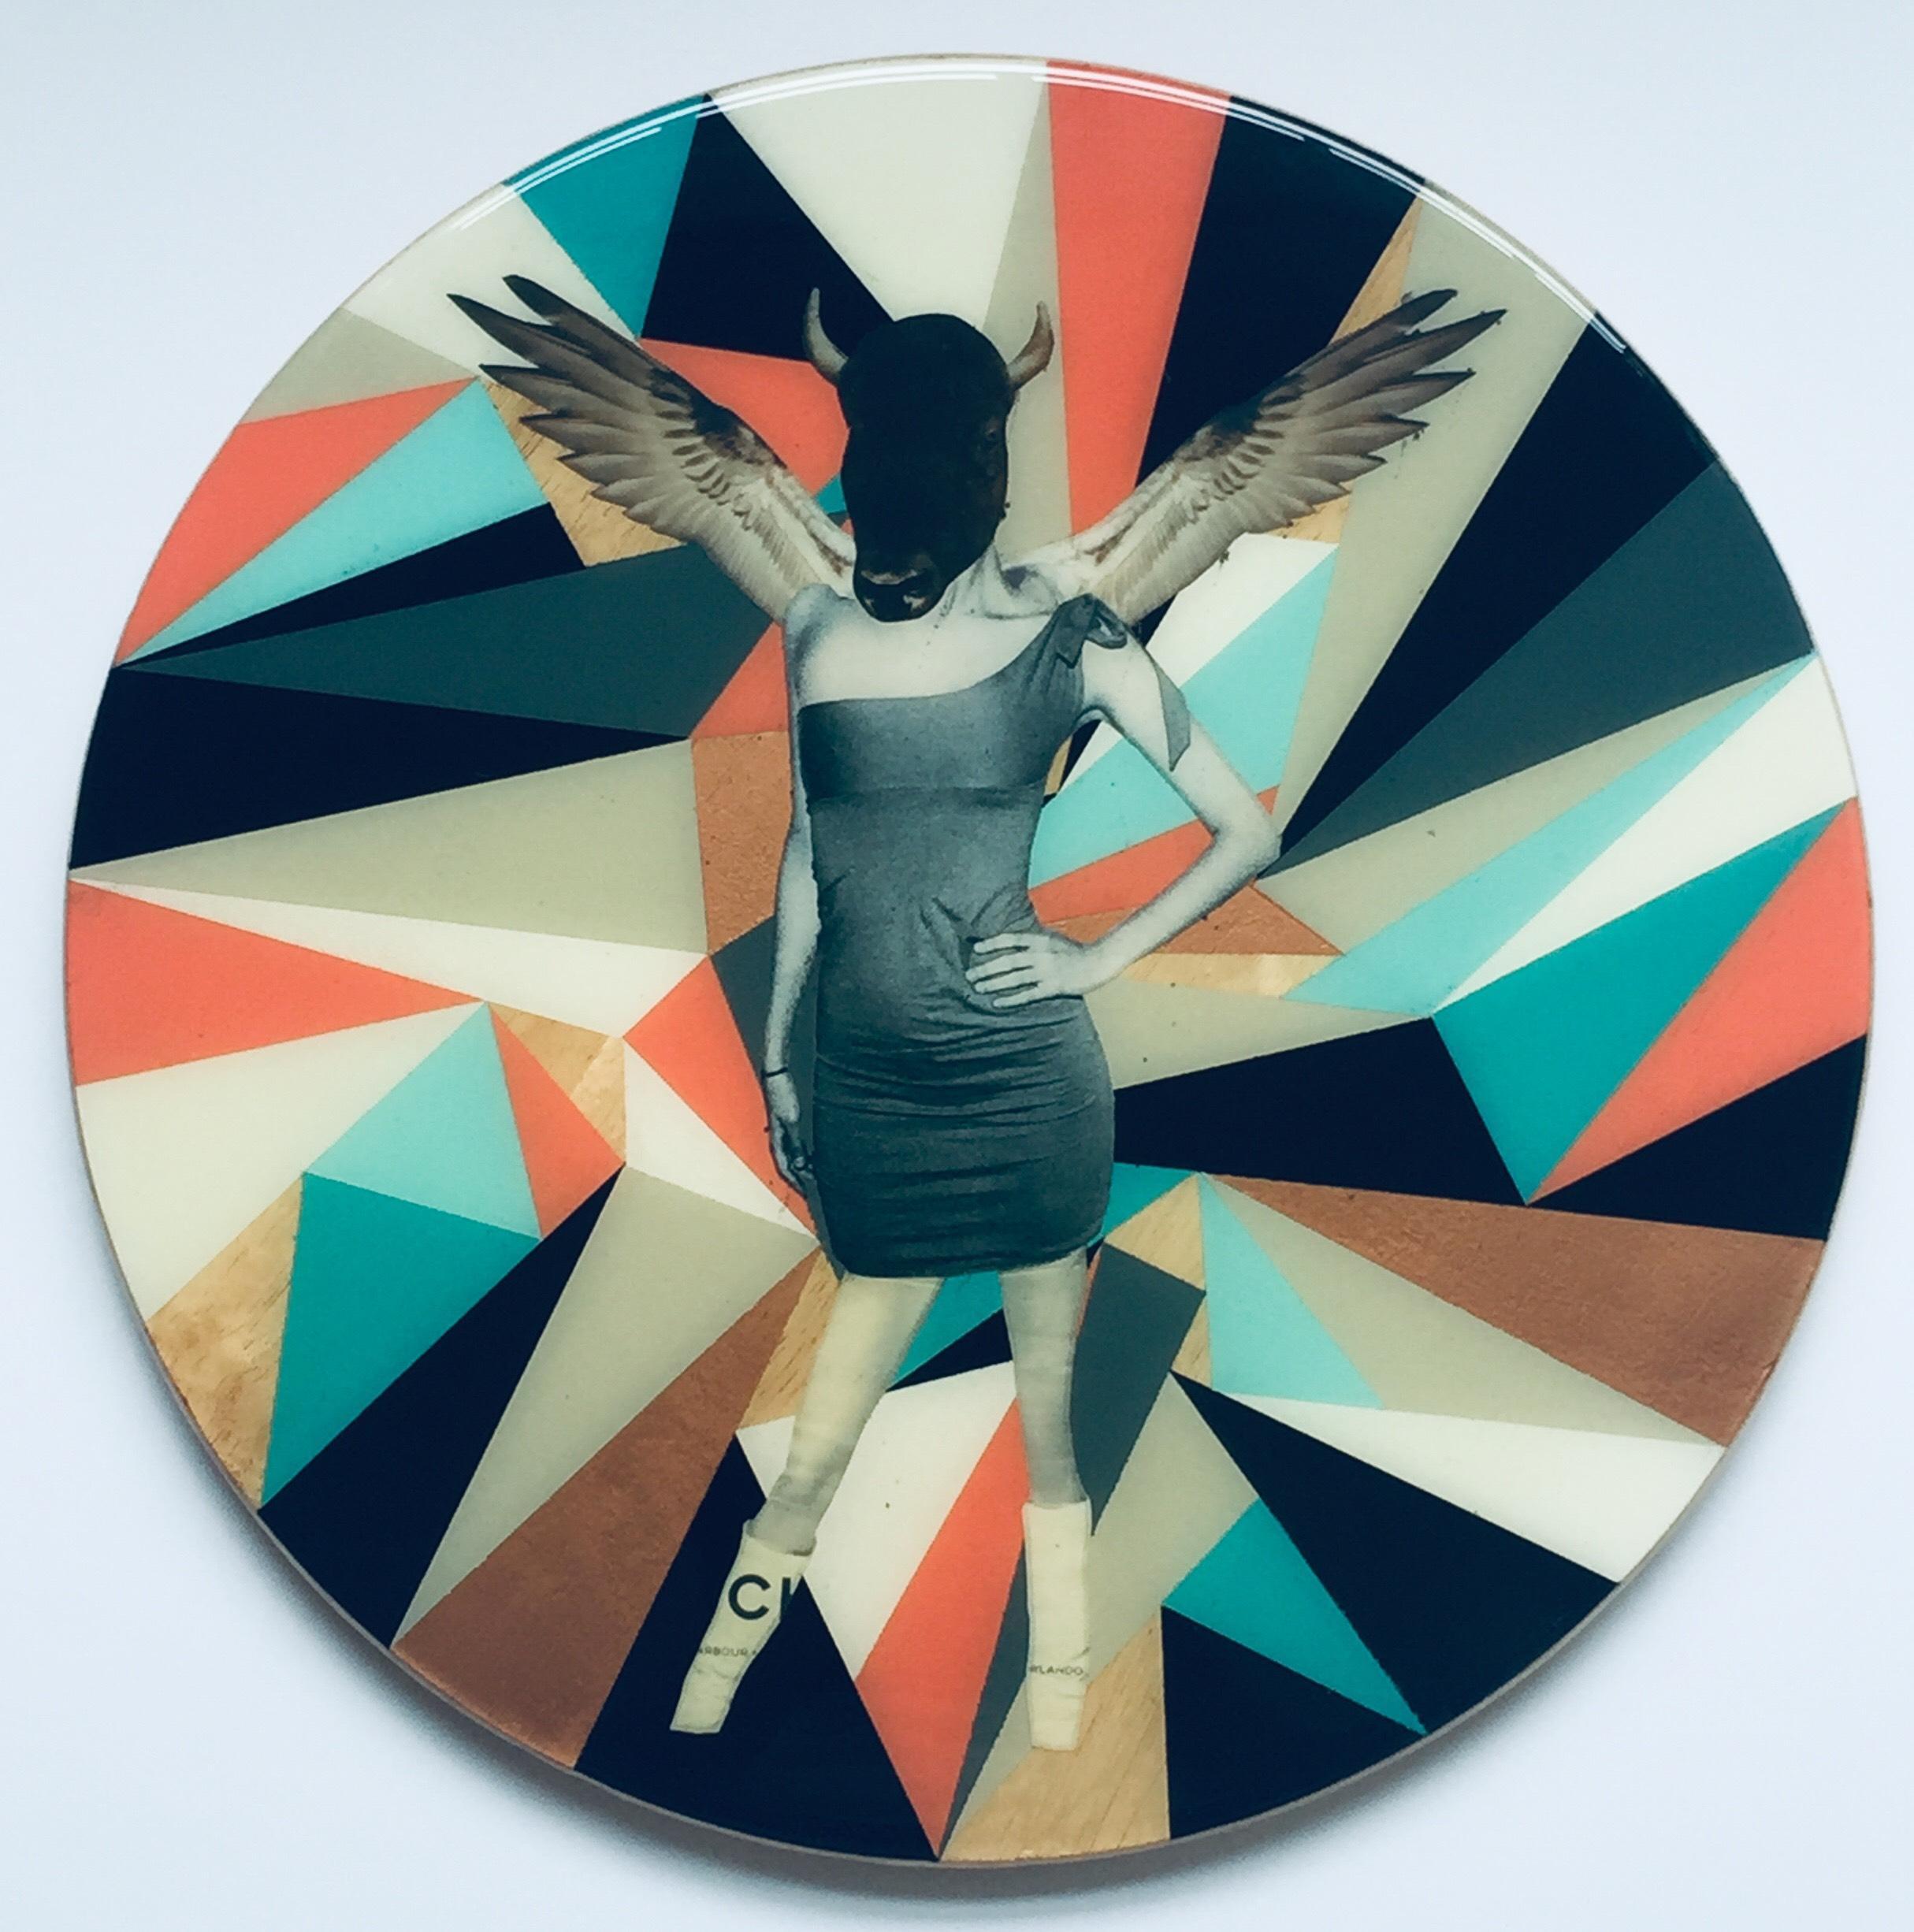 Untitled No. 9, Mixed Media on Wood